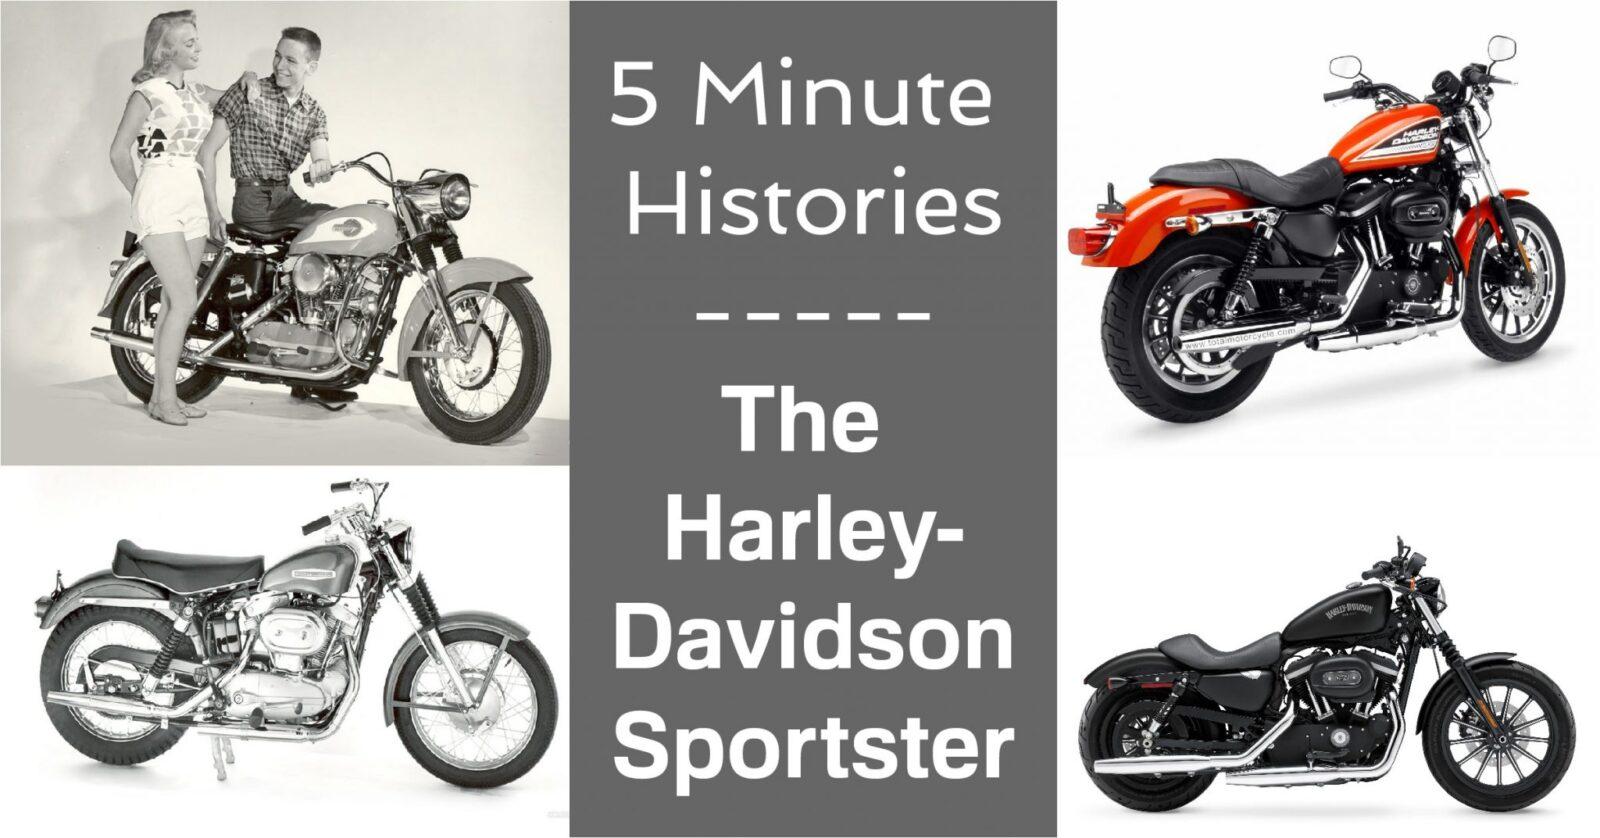 eBay Facebook 5 Minute Harley 1600x838 - 5 Minute Histories: Harley-Davidson Sportster